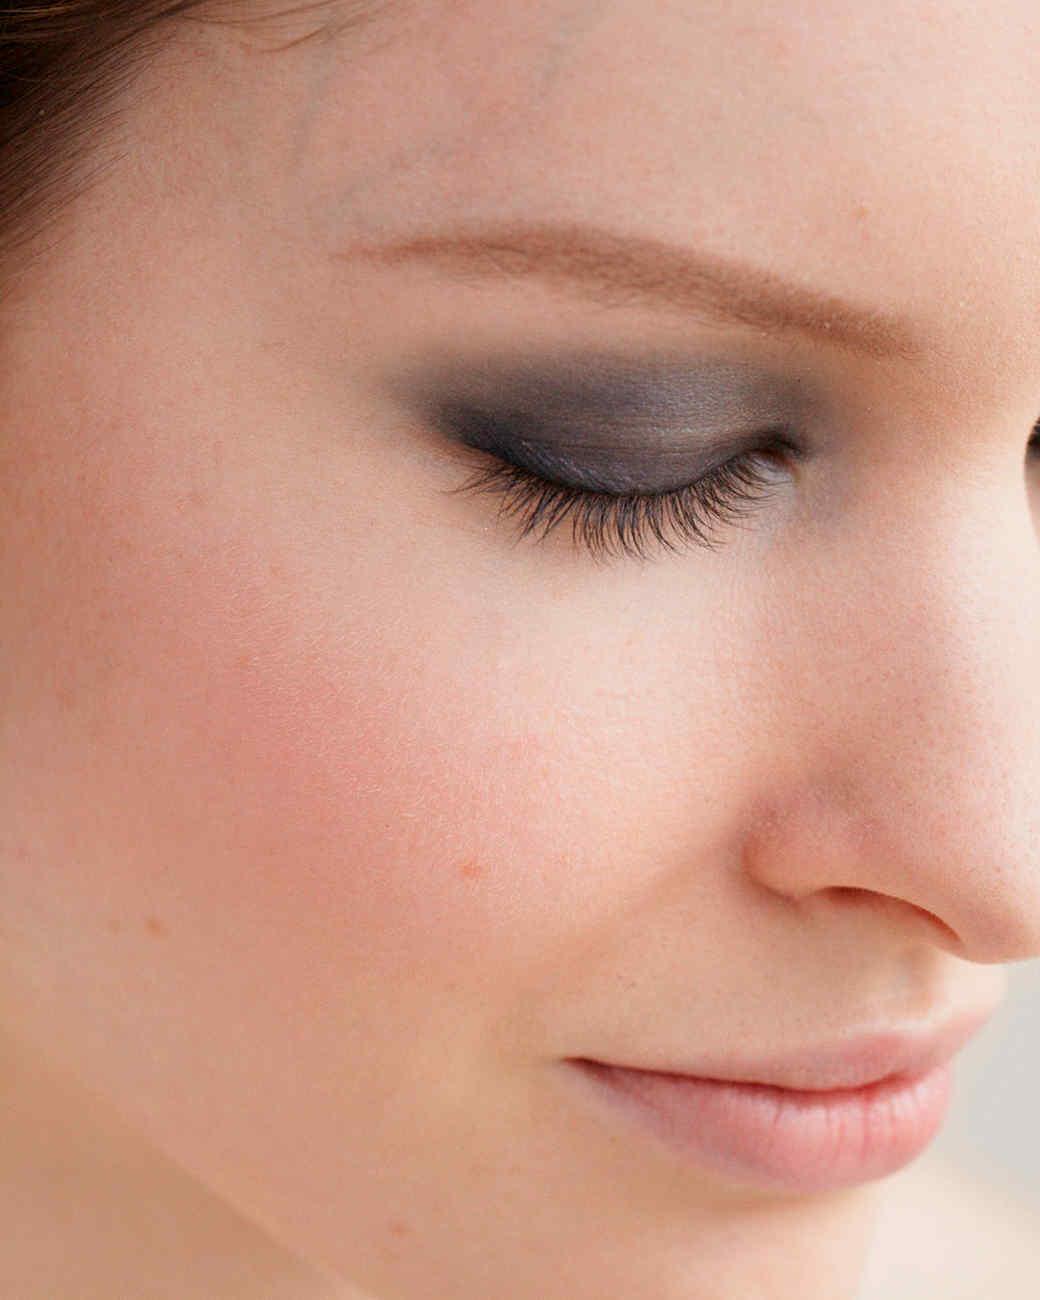 beauty-center-smokey-eyes-2-d108198.jpg